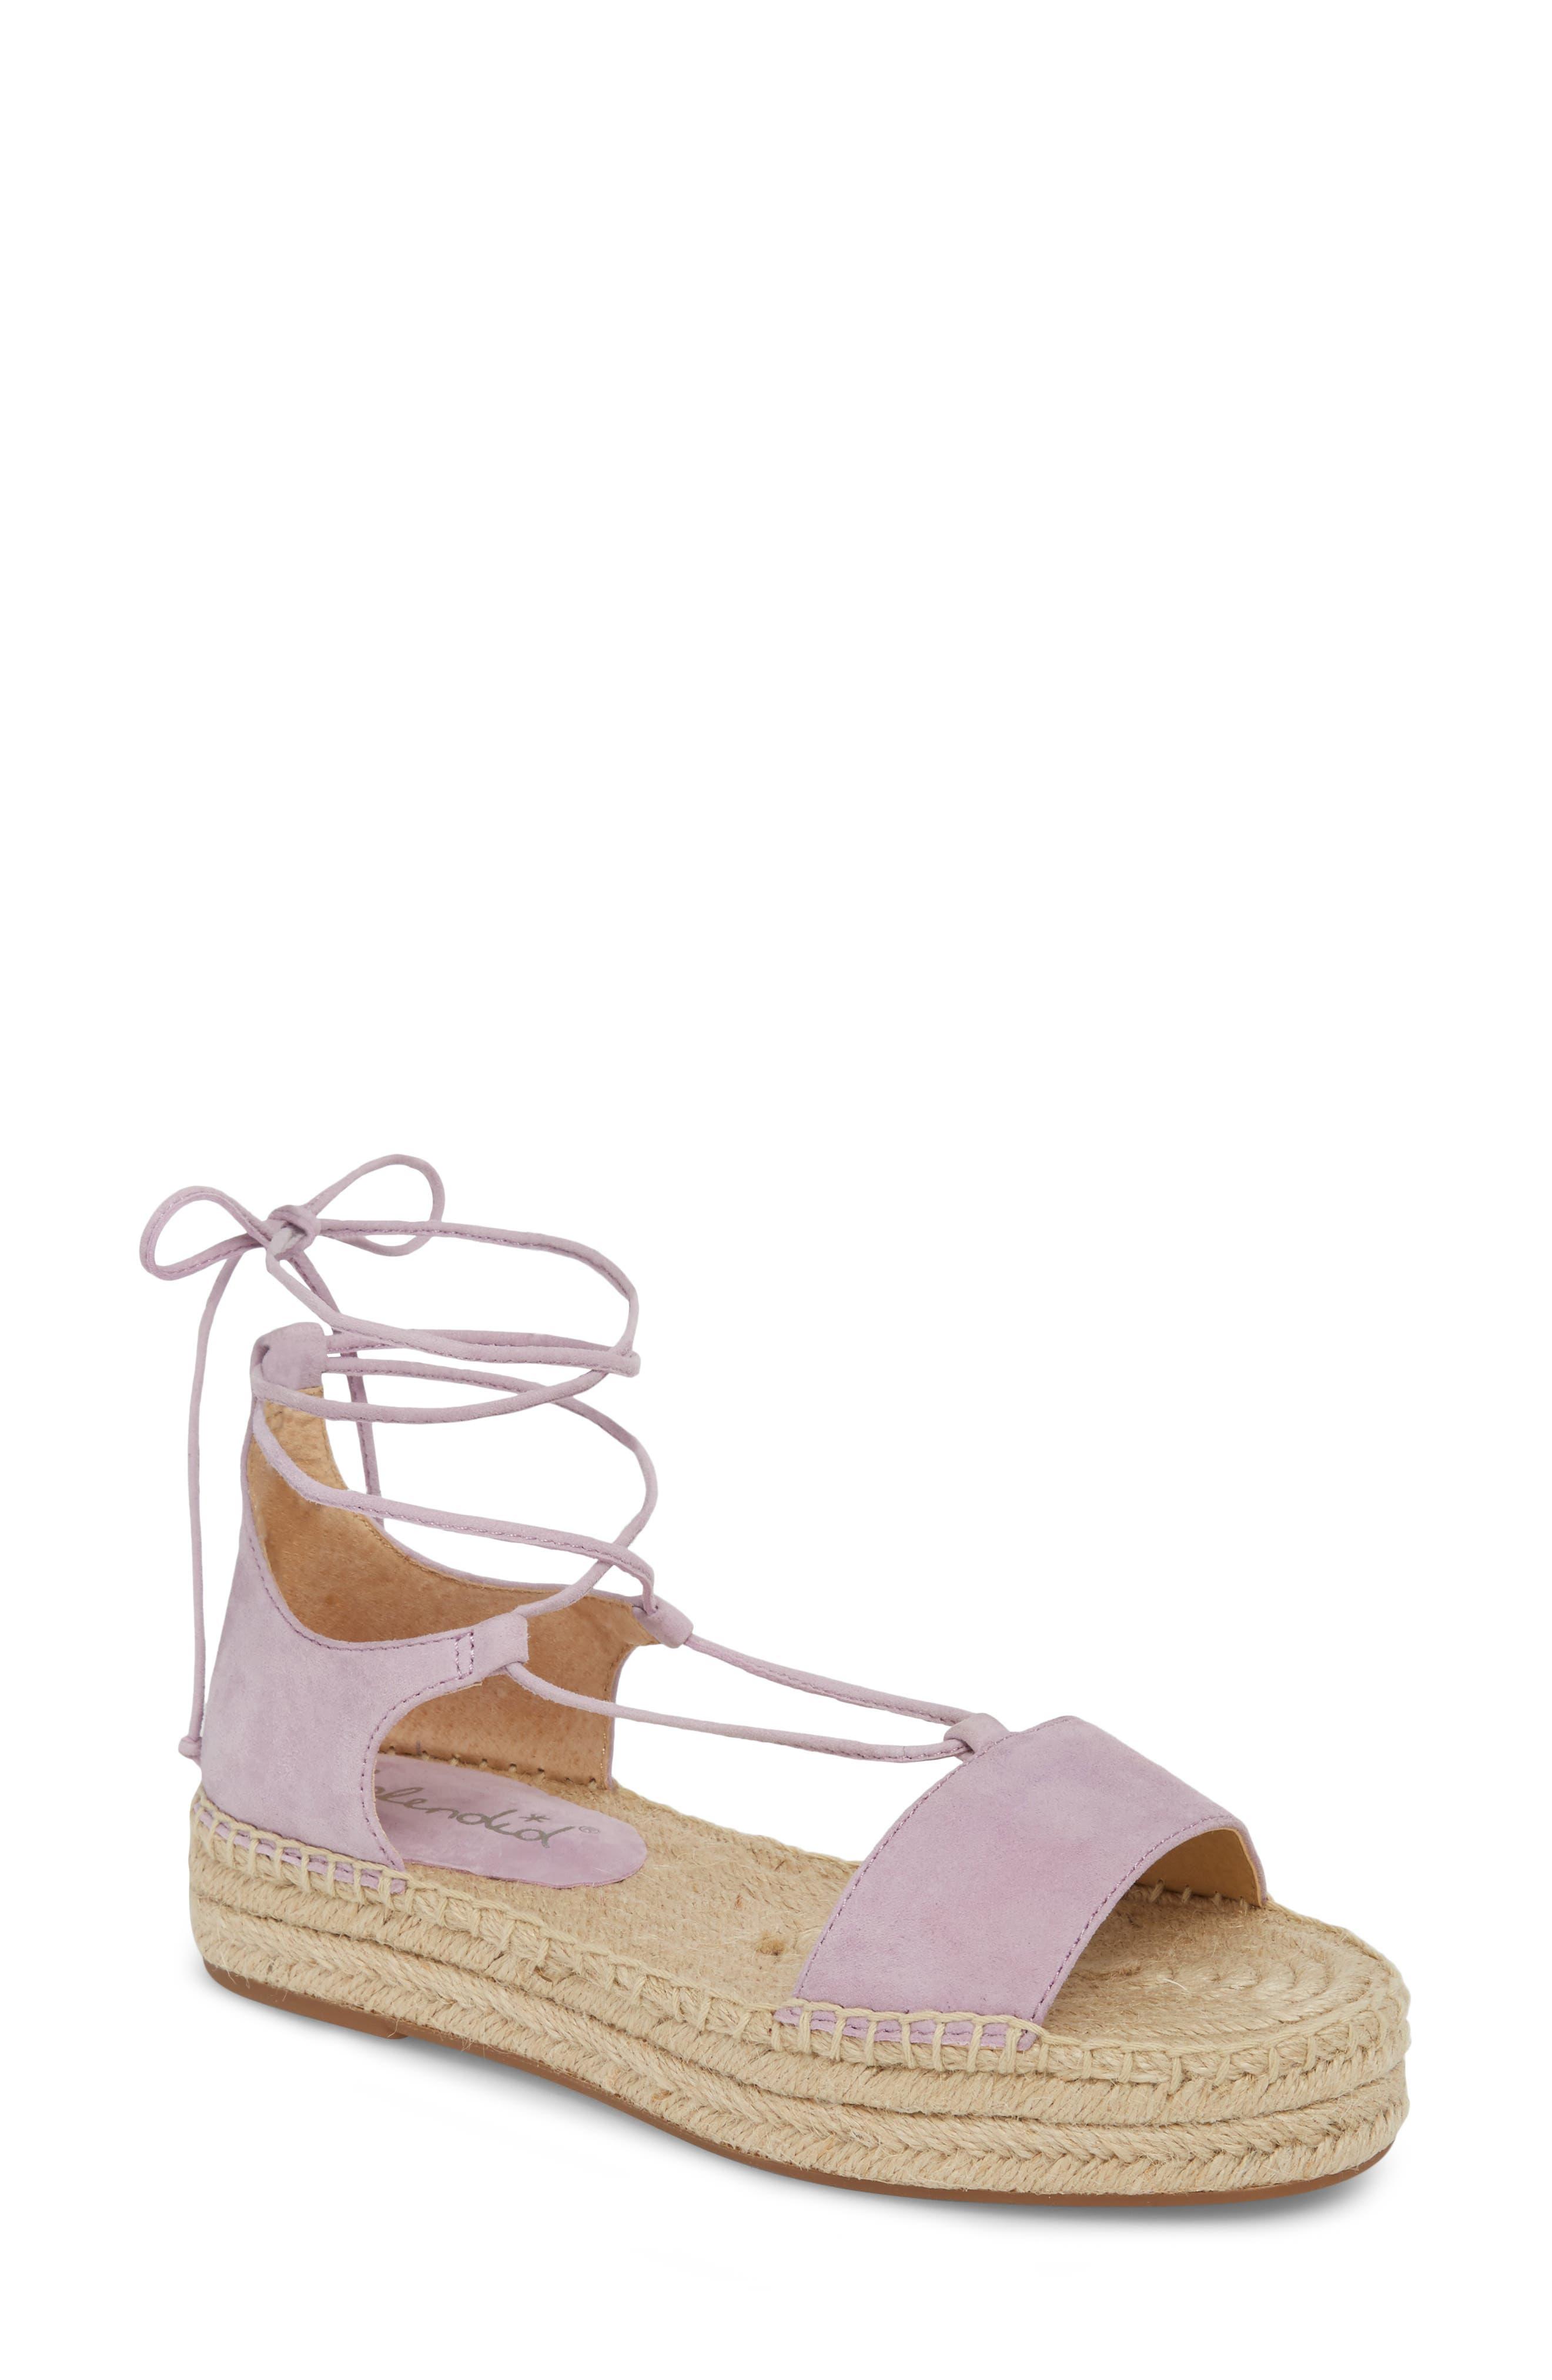 Splendid Fernanda Wraparound Platform Sandal, Purple